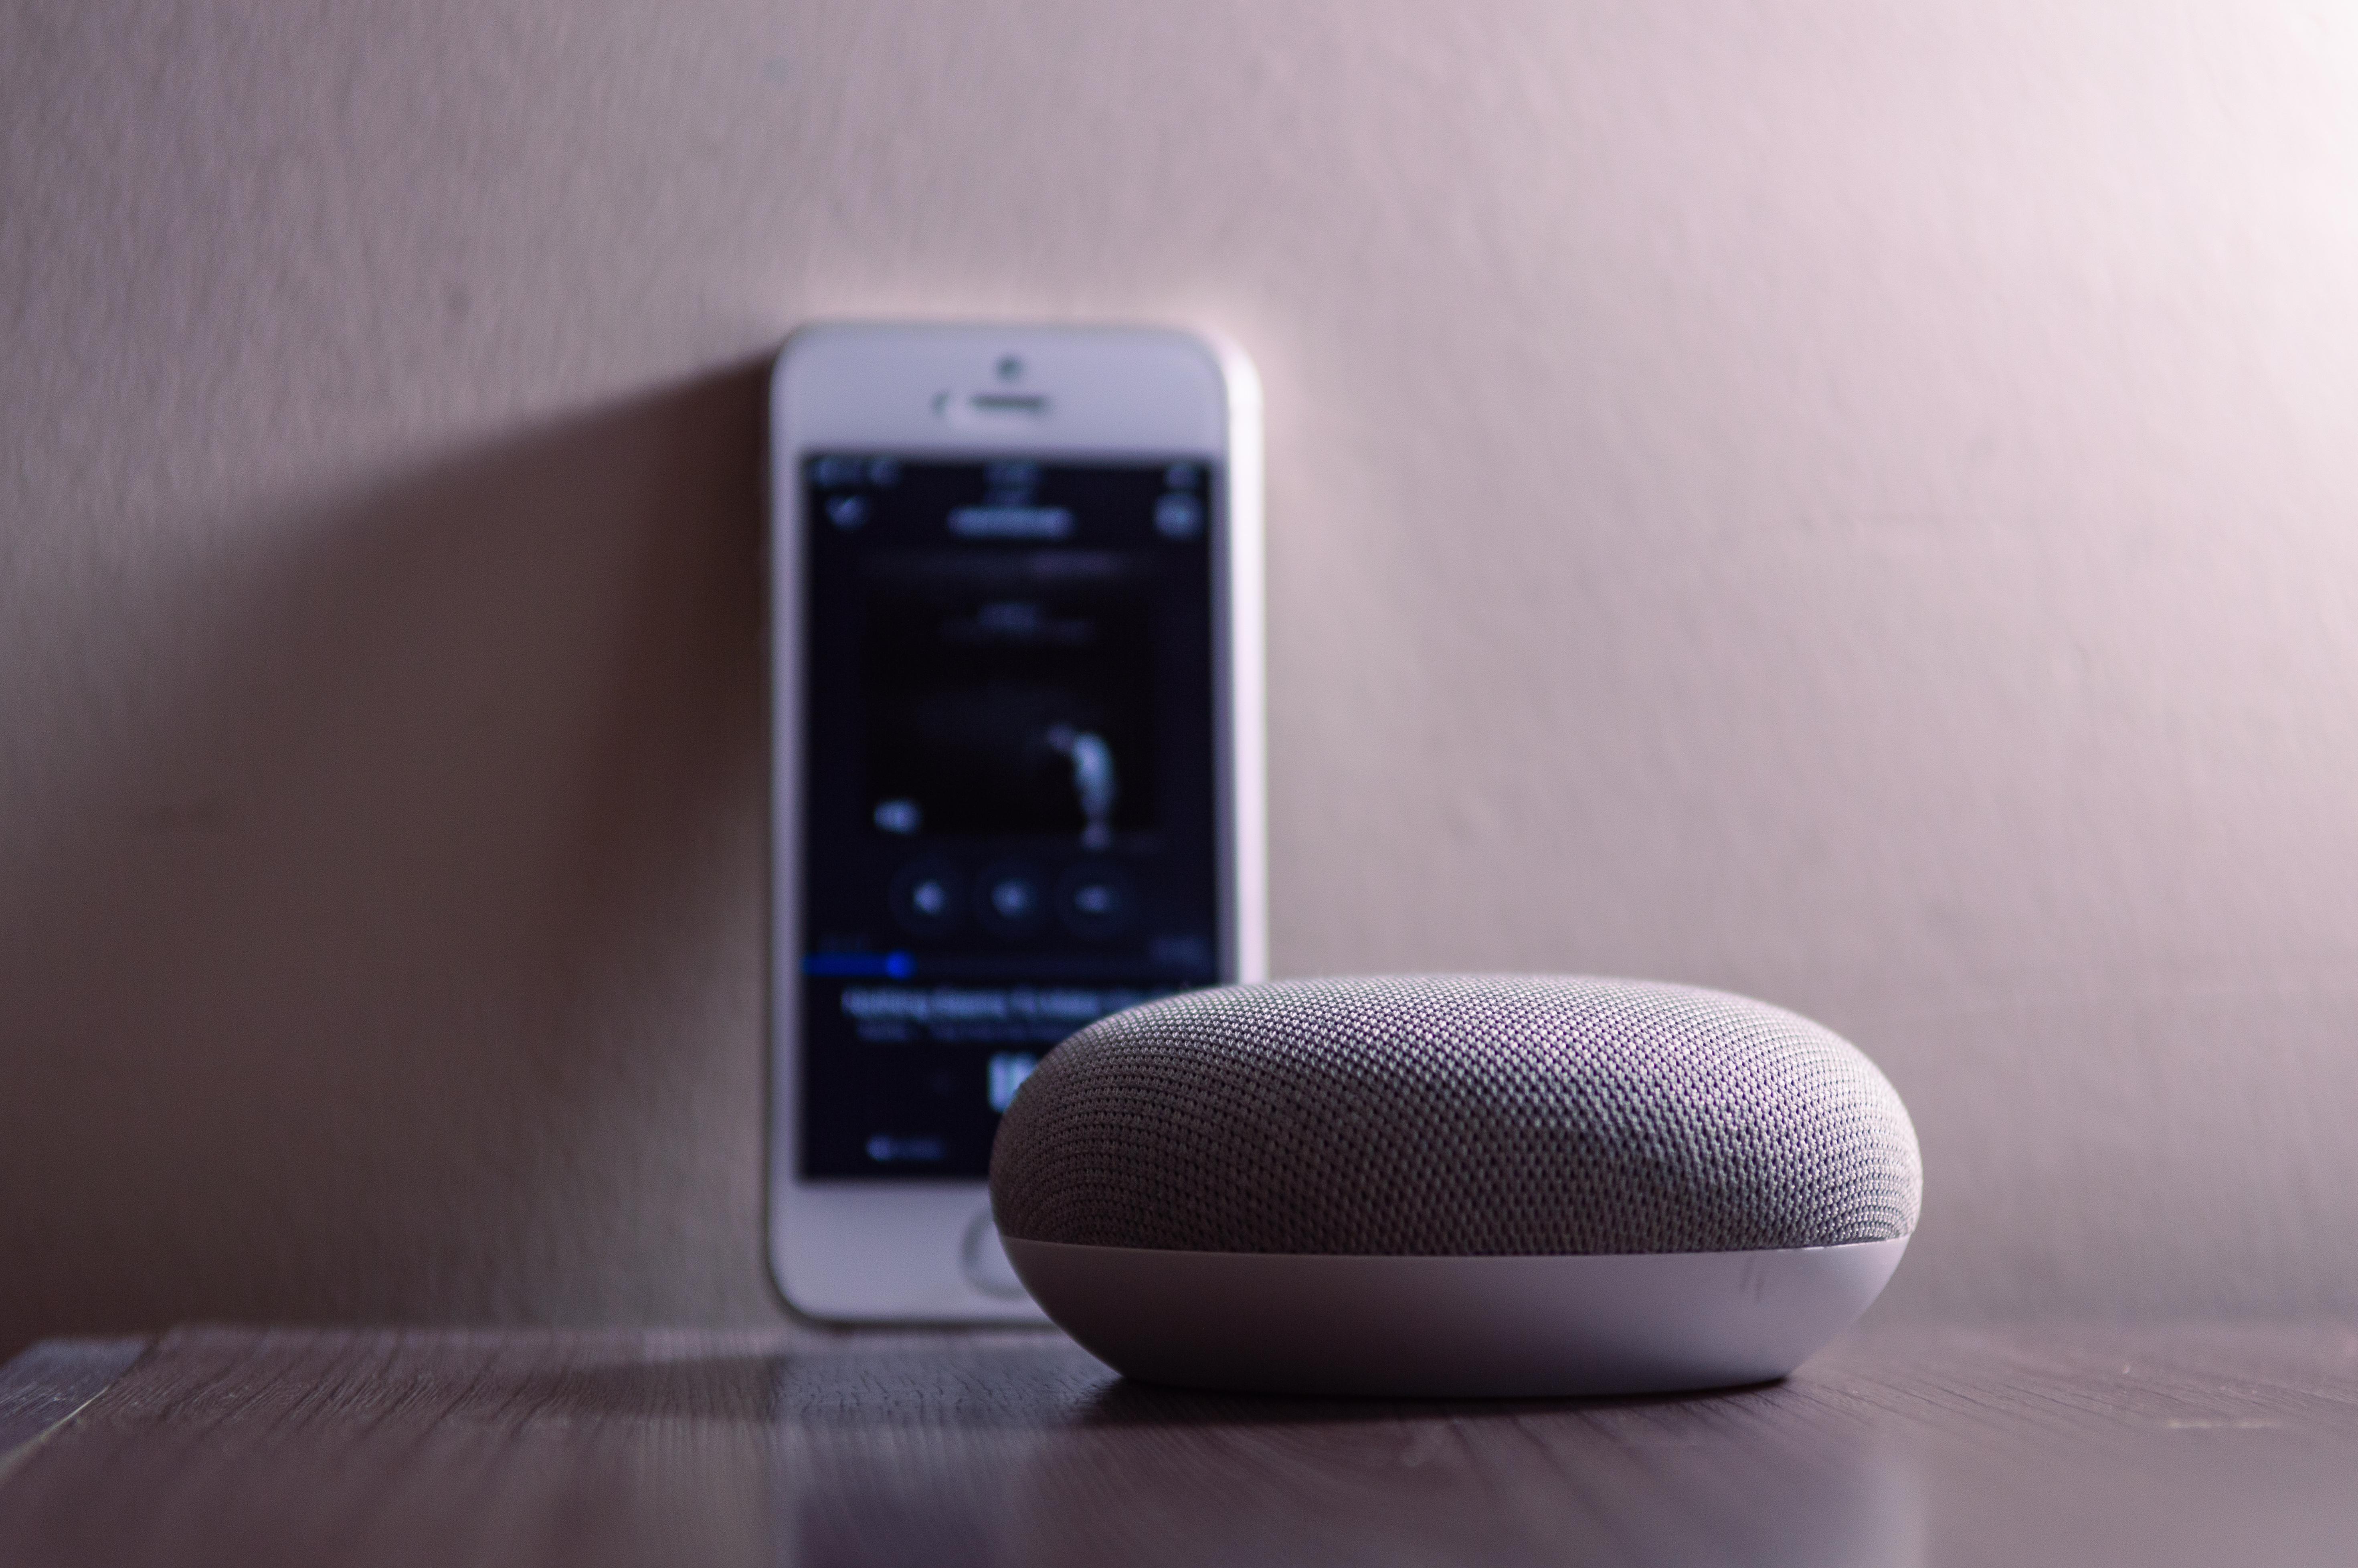 Gray Google Home Mini Beside Silver Iphone 5s